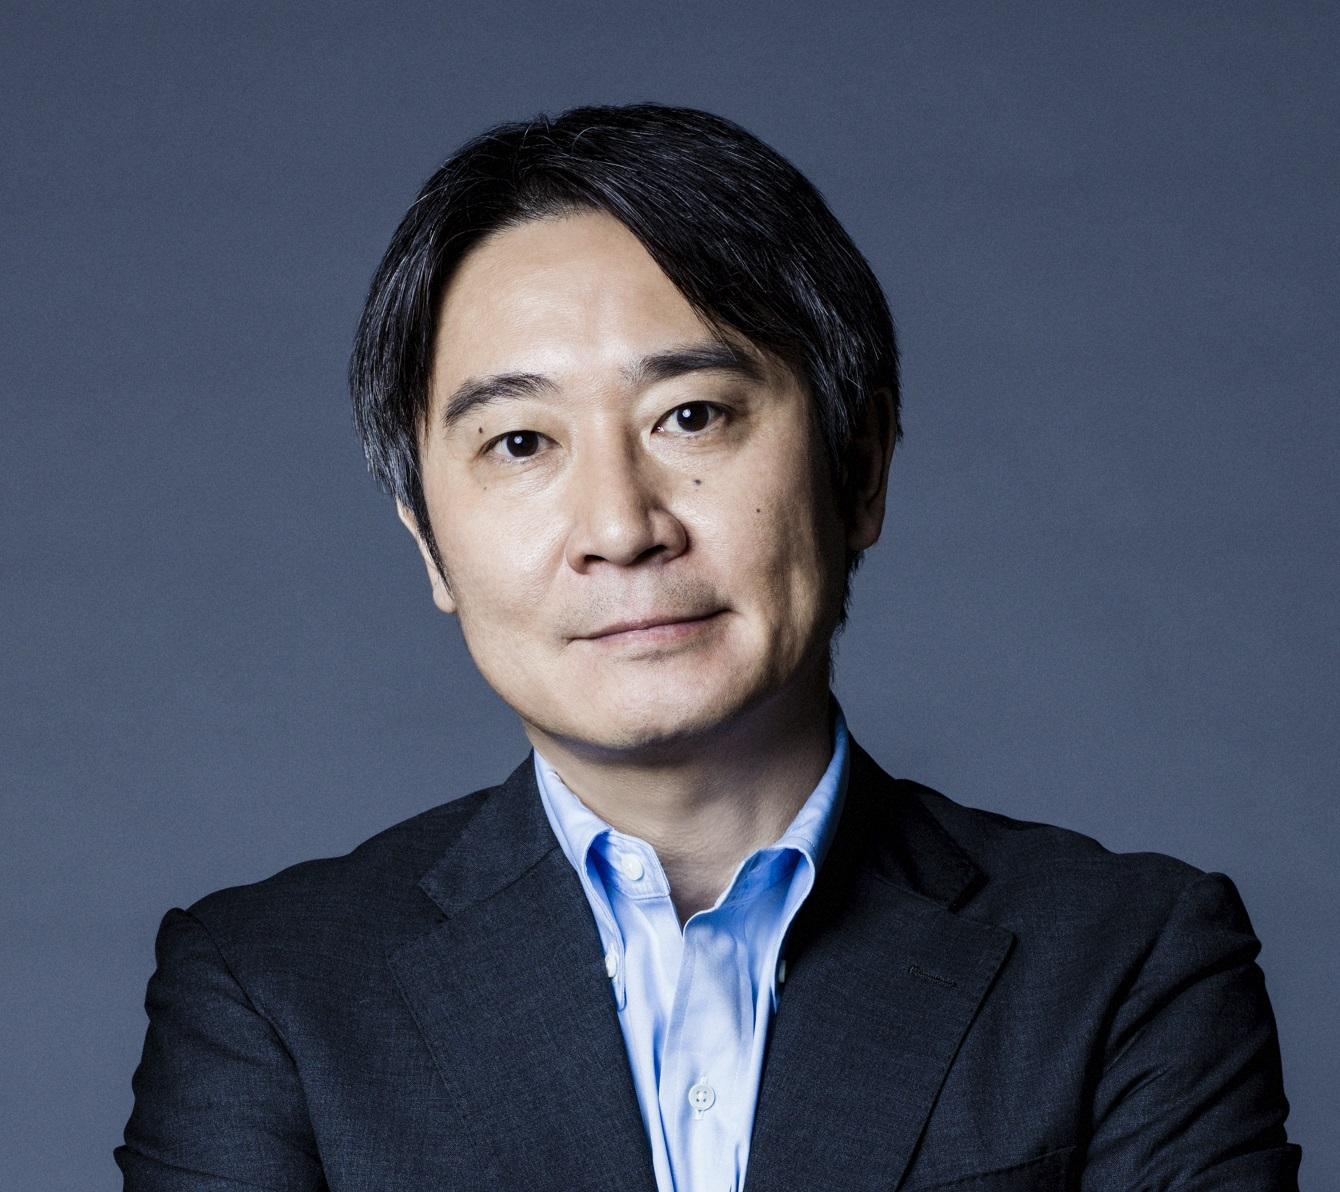 あいわ税理士法人 代表社員 杉山 康弘氏